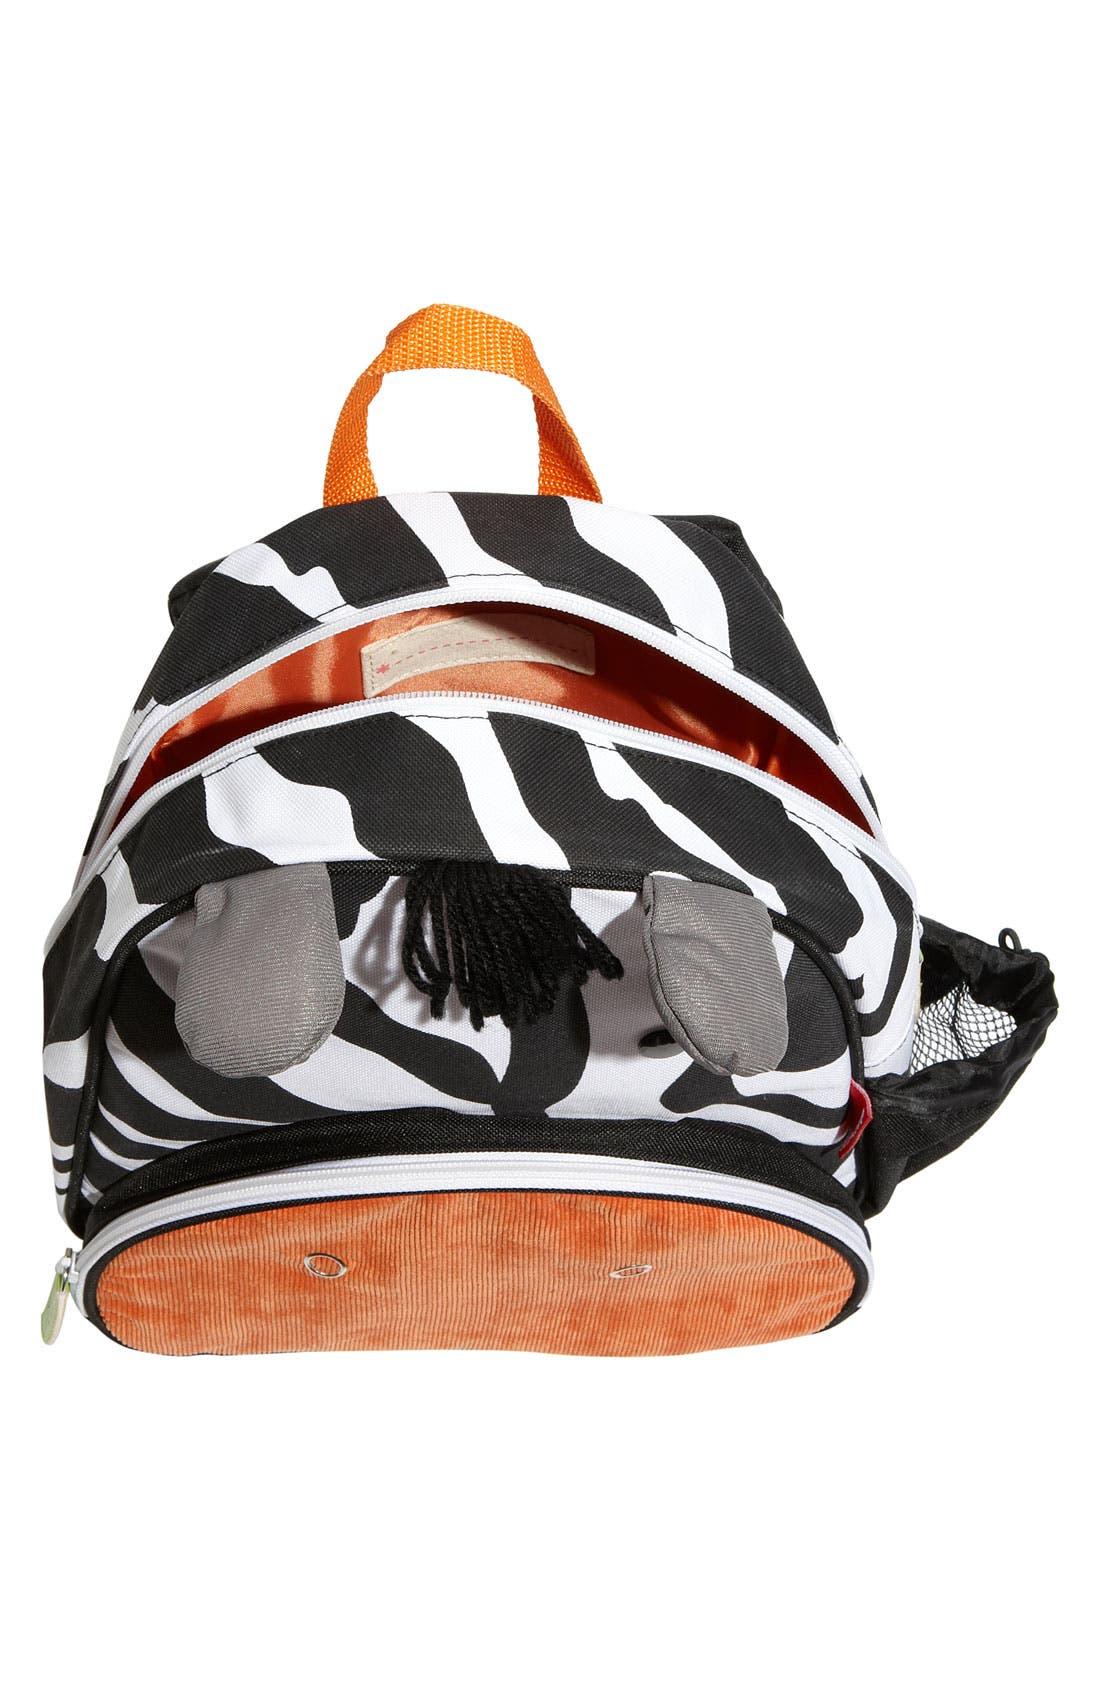 Zoo Pack Backpack,                             Alternate thumbnail 3, color,                             White/ Black